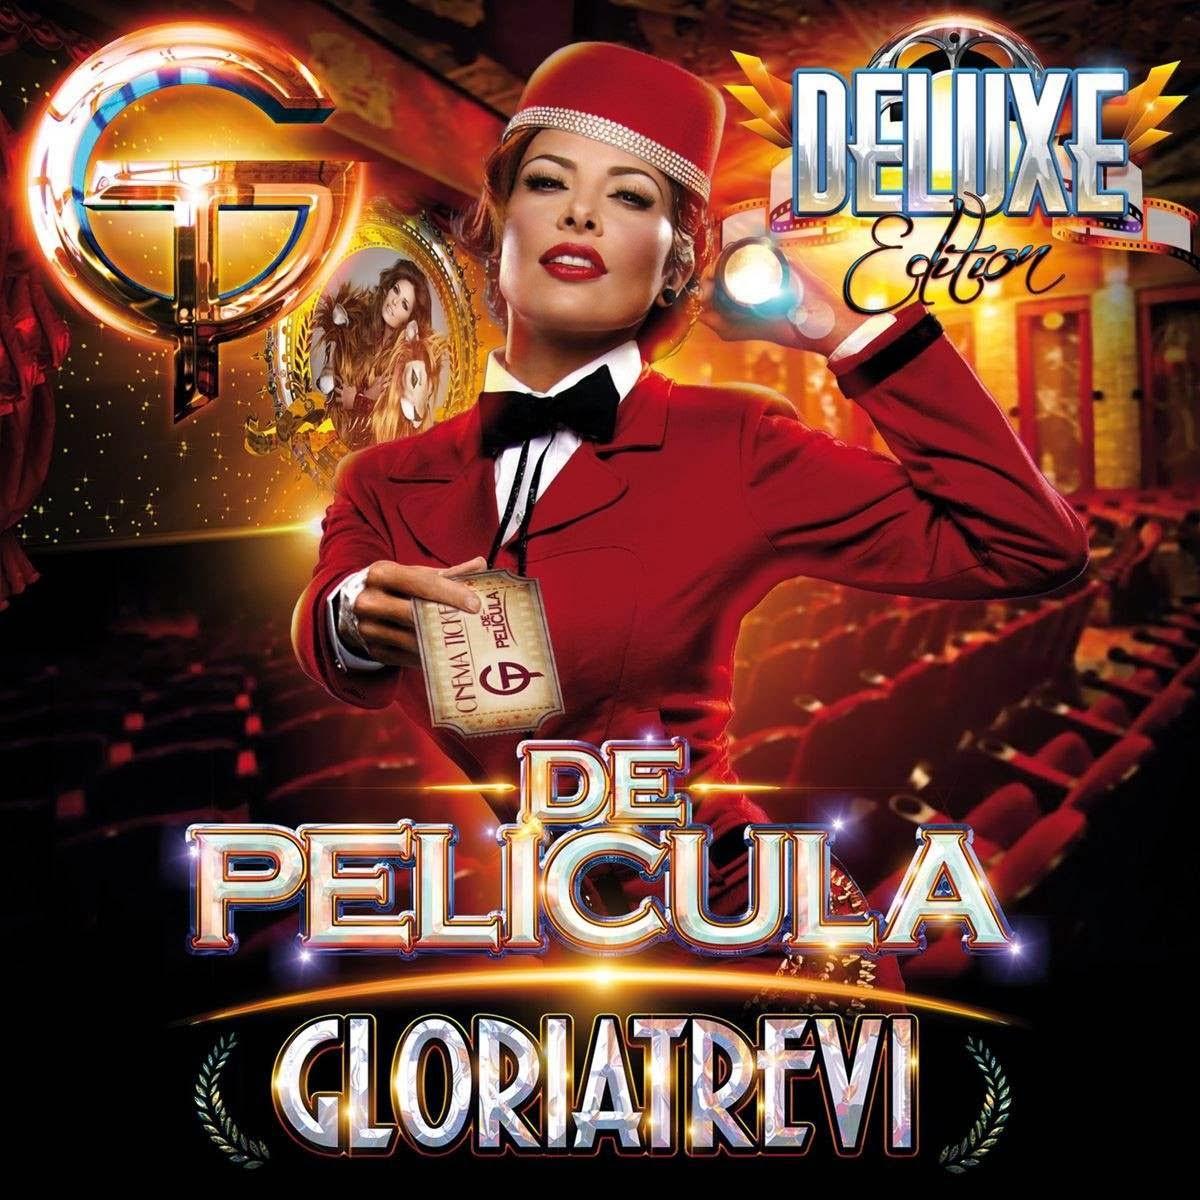 GLORIA TREVI - De Película (Deluxe Edition) (2013)